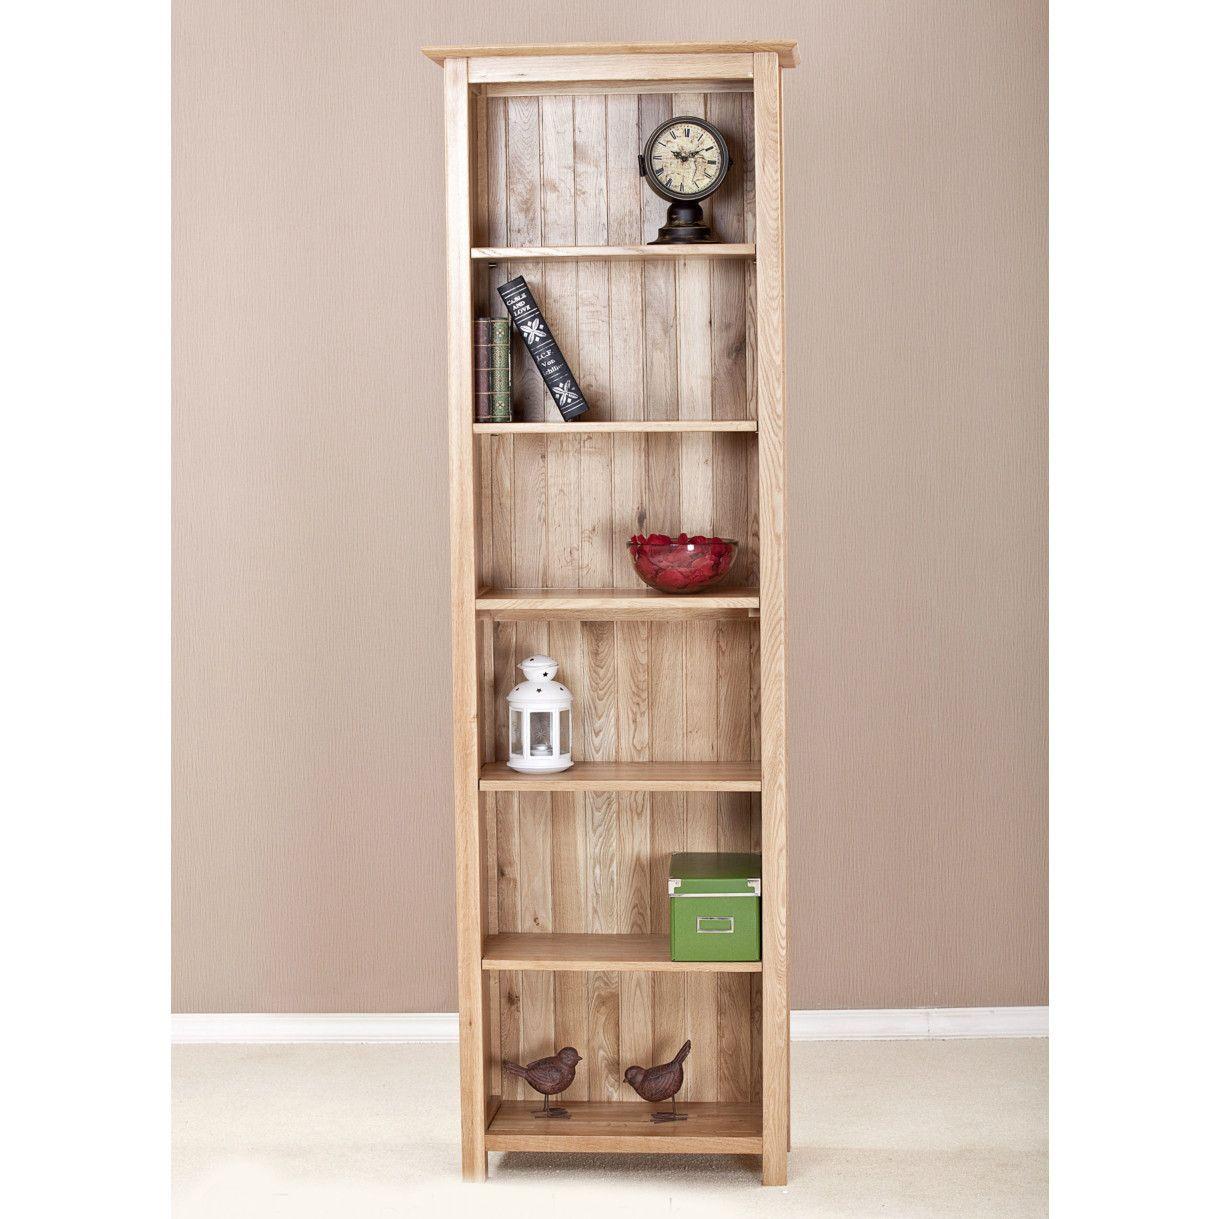 Ashton Oak Tall Narrow Bookcase Tall Narrow Bookcase Deep throughout size 1219 X 1219